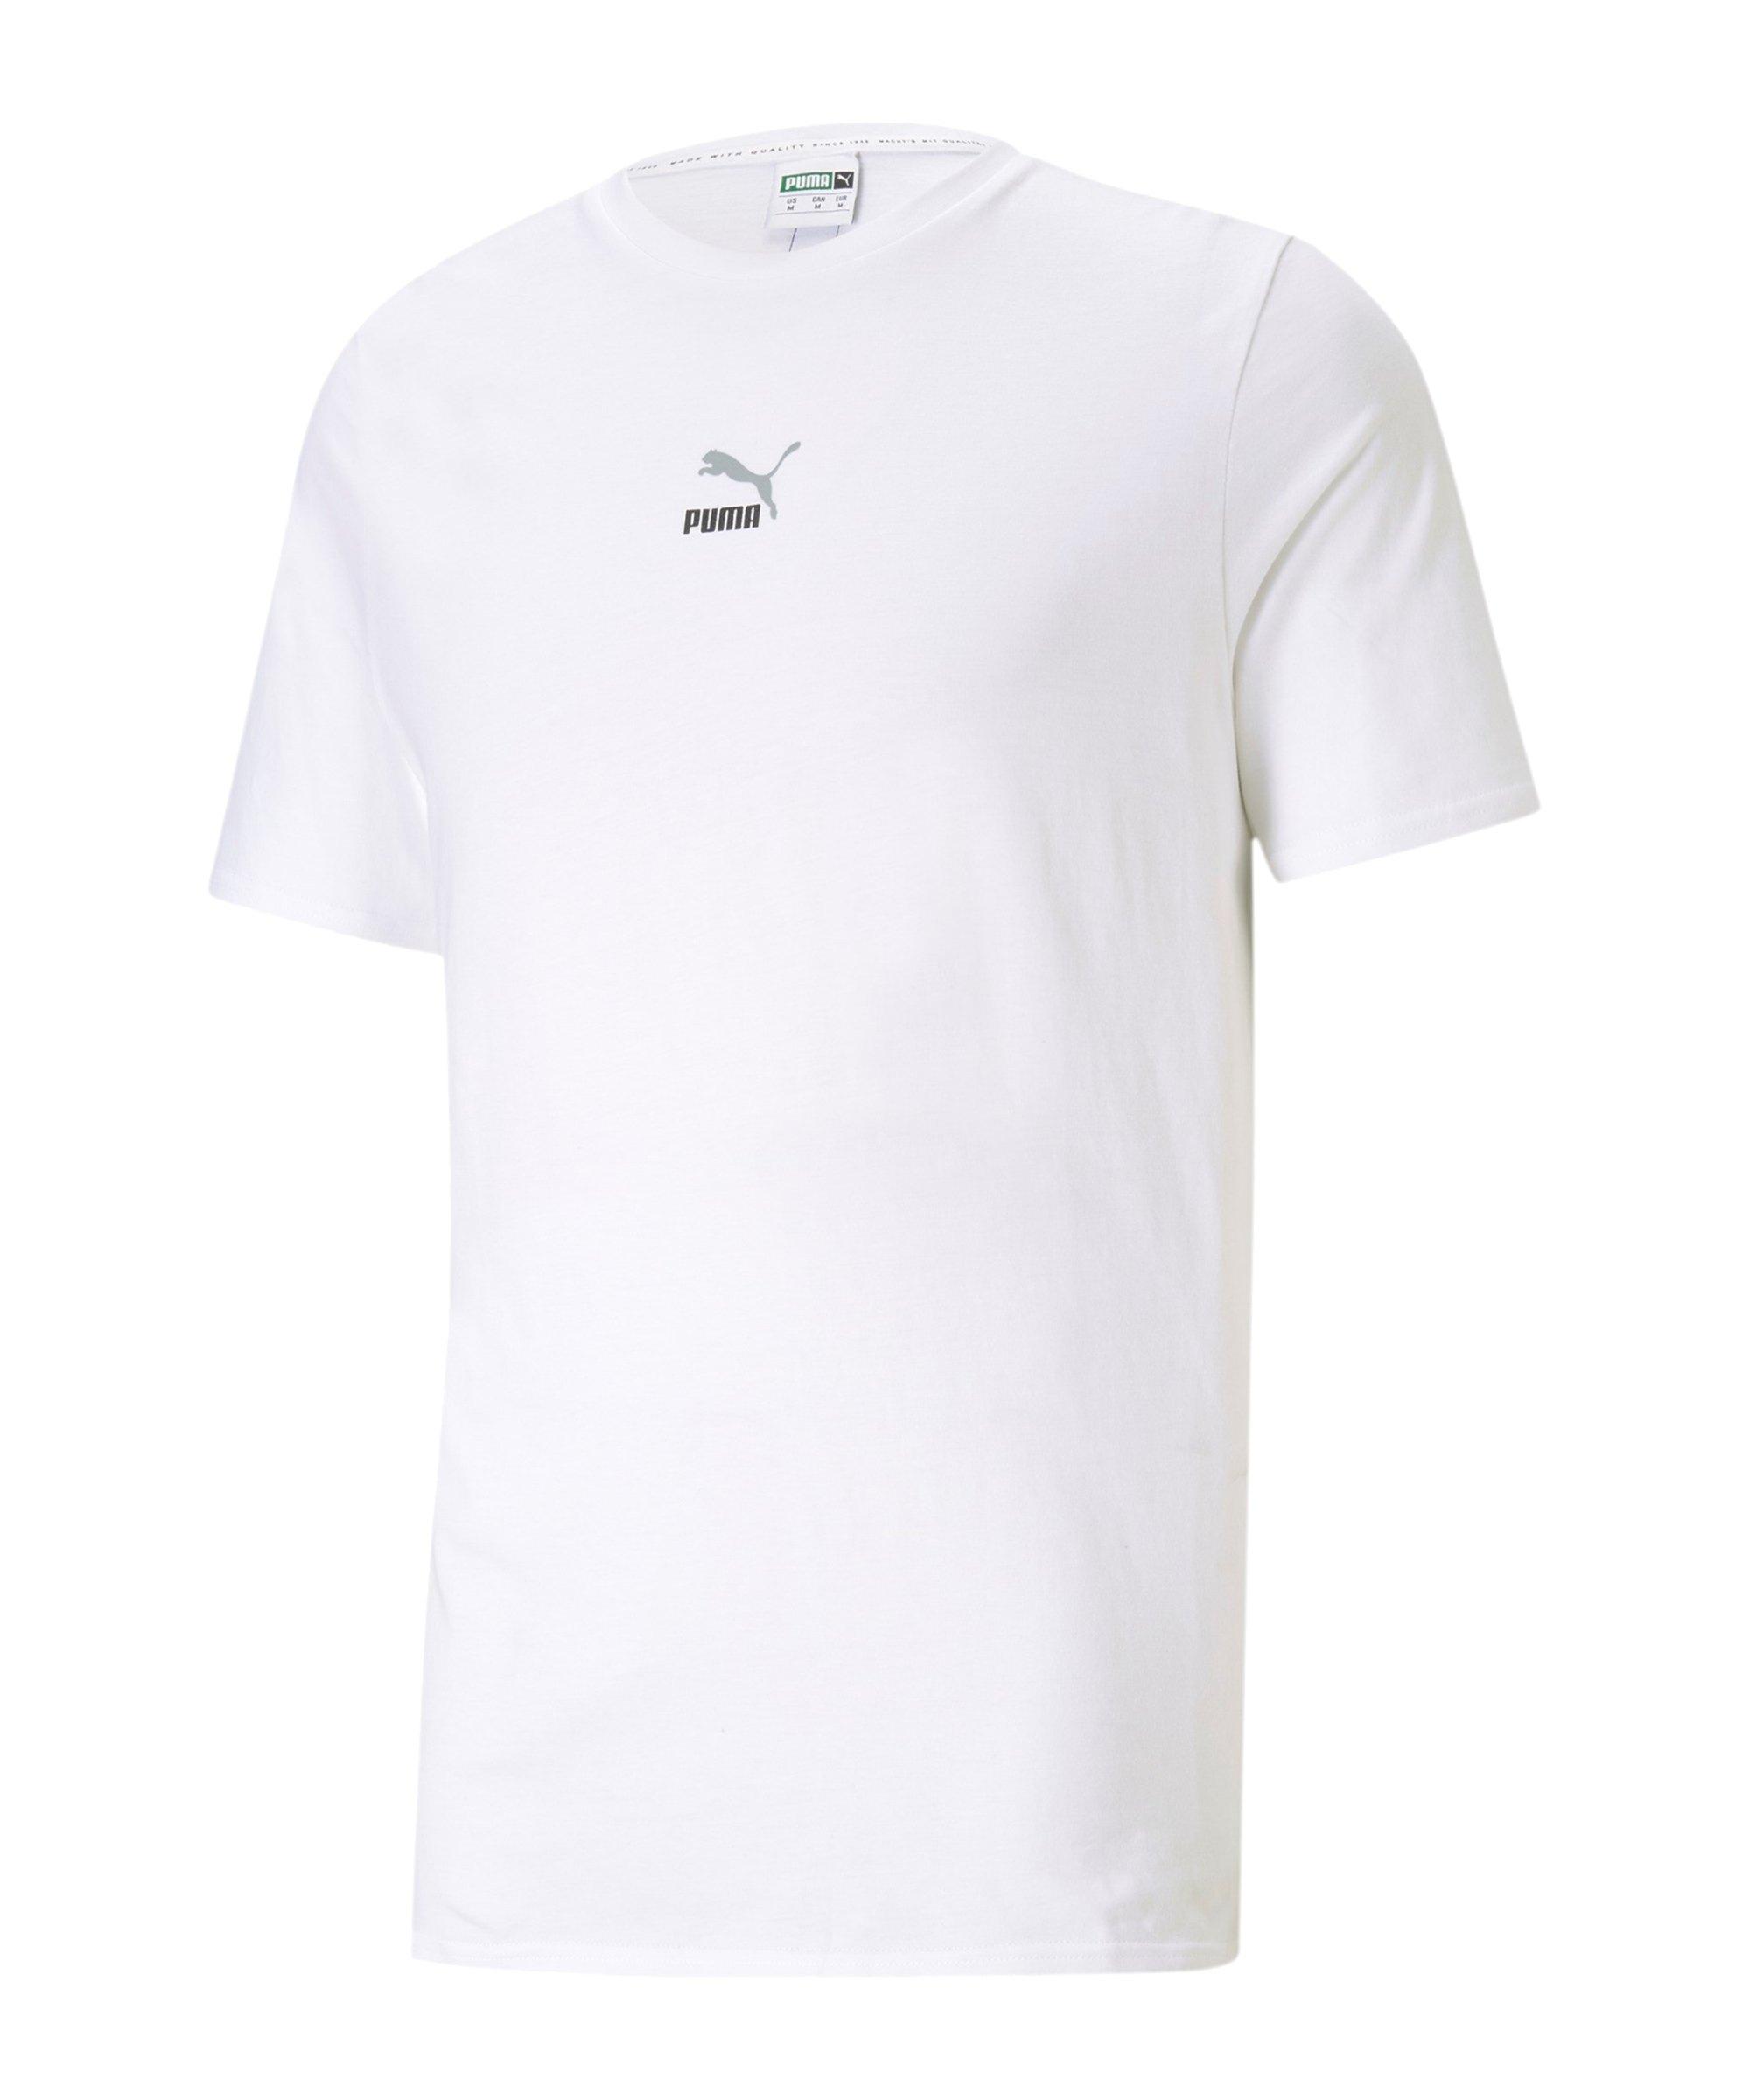 PUMA ELEVATE Tape T-Shirt Weiss F02 - weiss